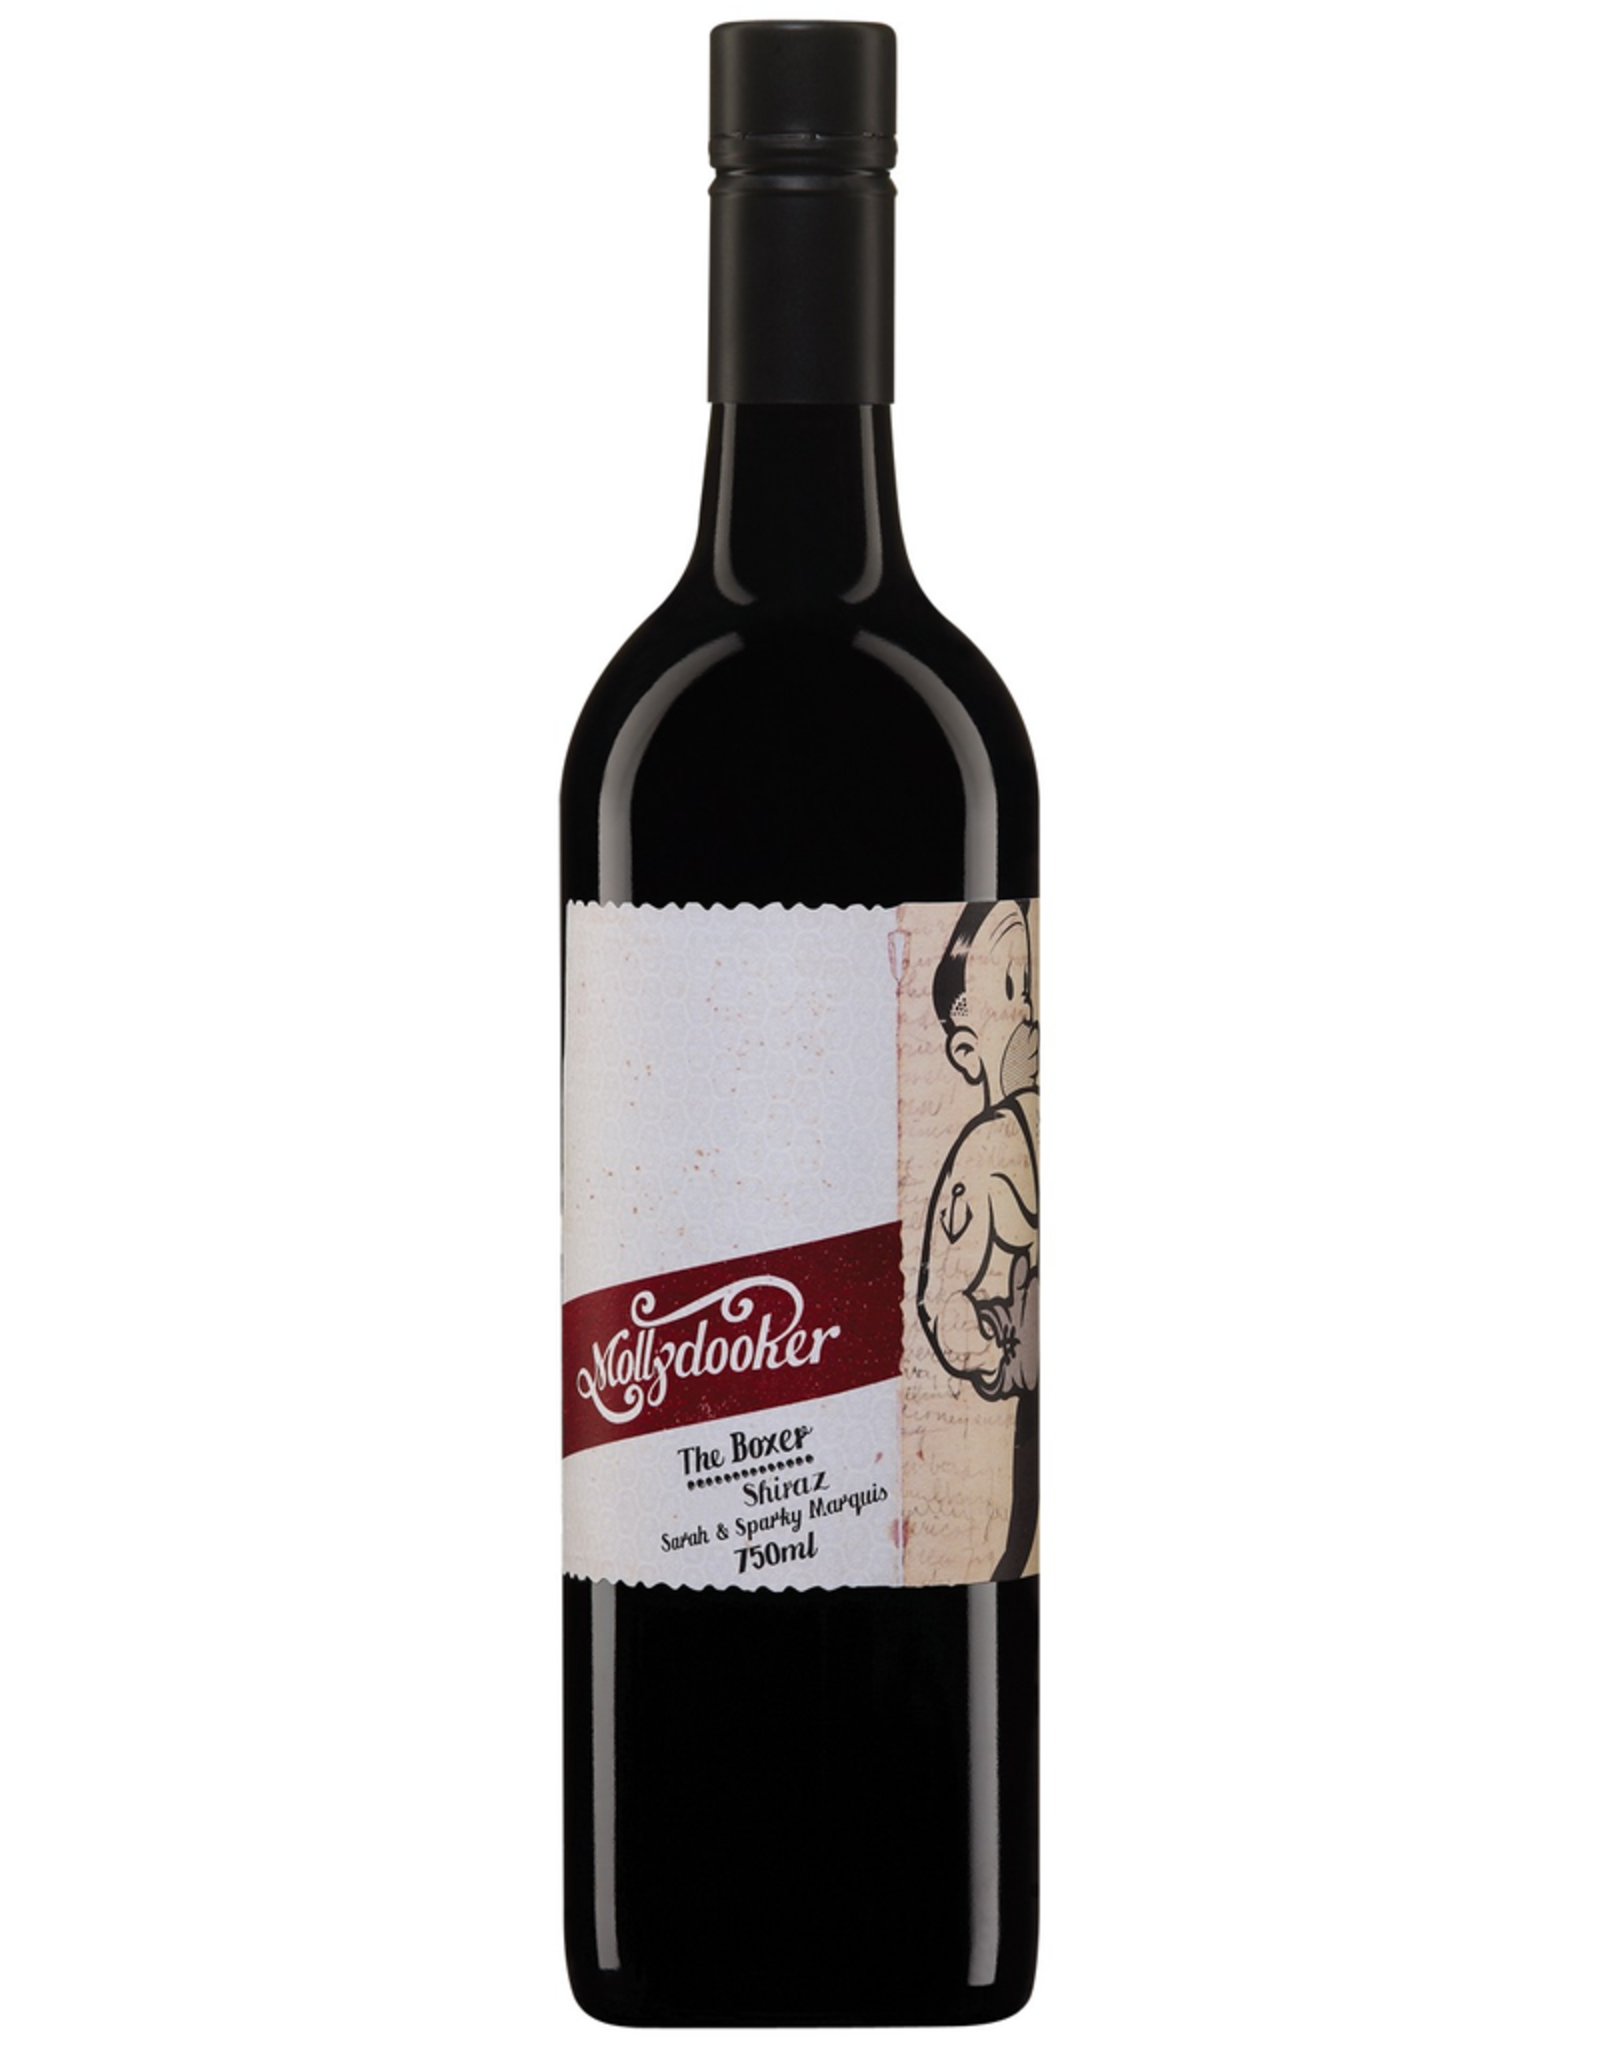 Red Wine 2018, Molly Dooker The Boxer, Shiraz, McLaren Vale,  South Australia, Australia, 15.5% Alc, CTnr, RP91